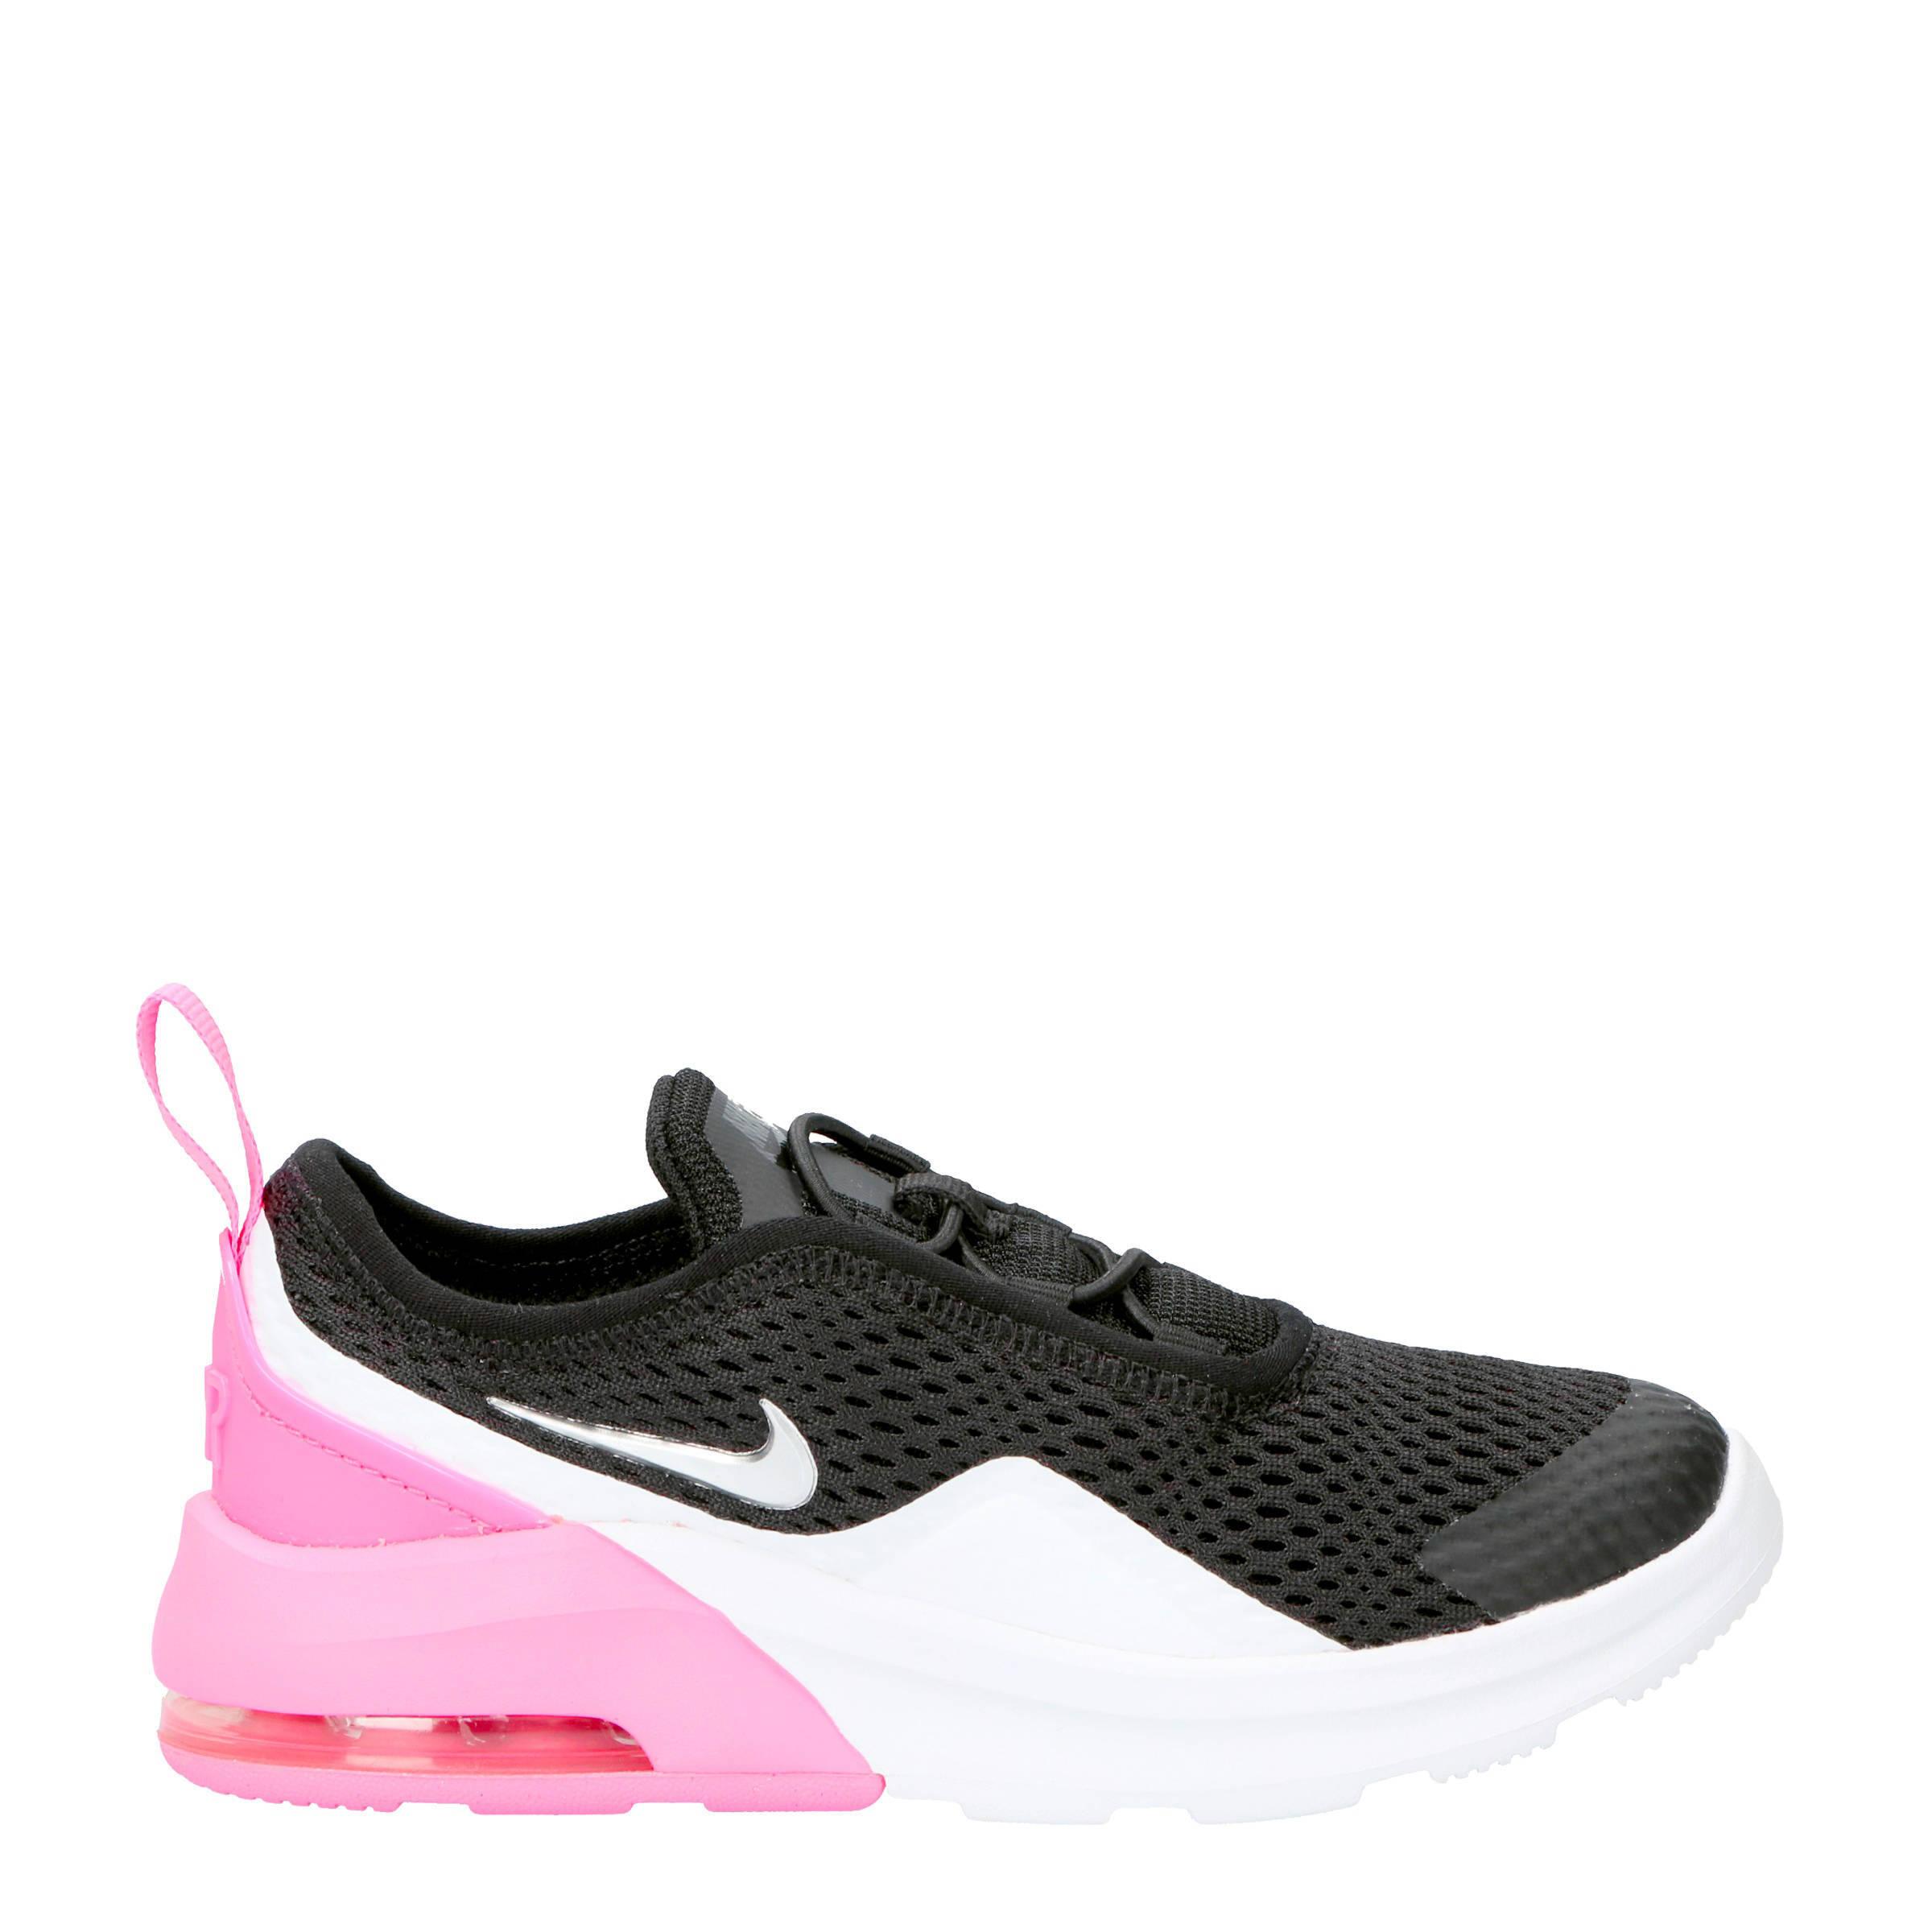 9e2ed075a7a Nike Air Max Motion 2 sneakers zwart/grijs/roze | wehkamp